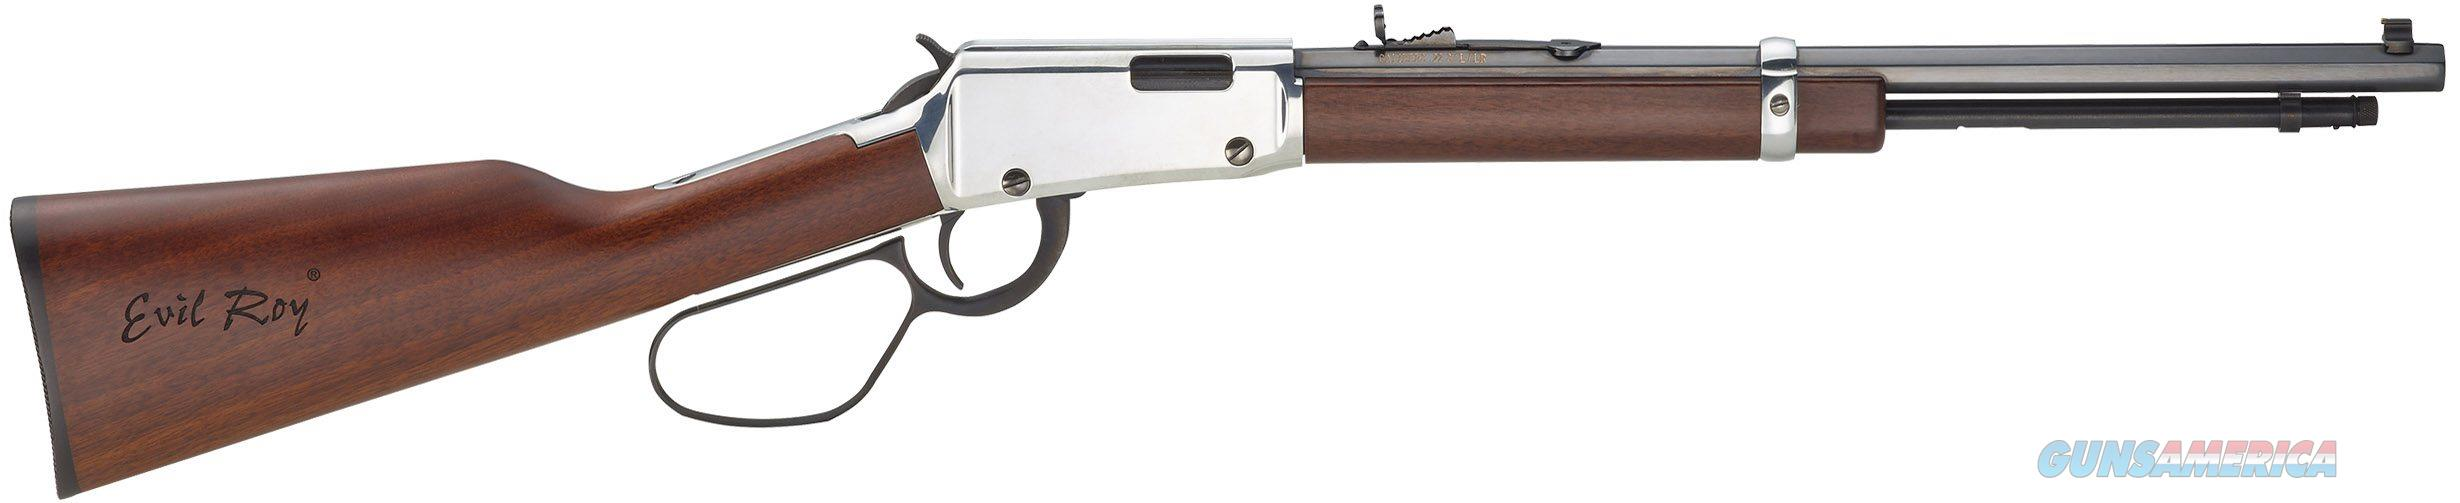 Henry H001TER Evil Roy Edition 22LR BRAND NEW  Guns > Rifles > Henry Rifle Company